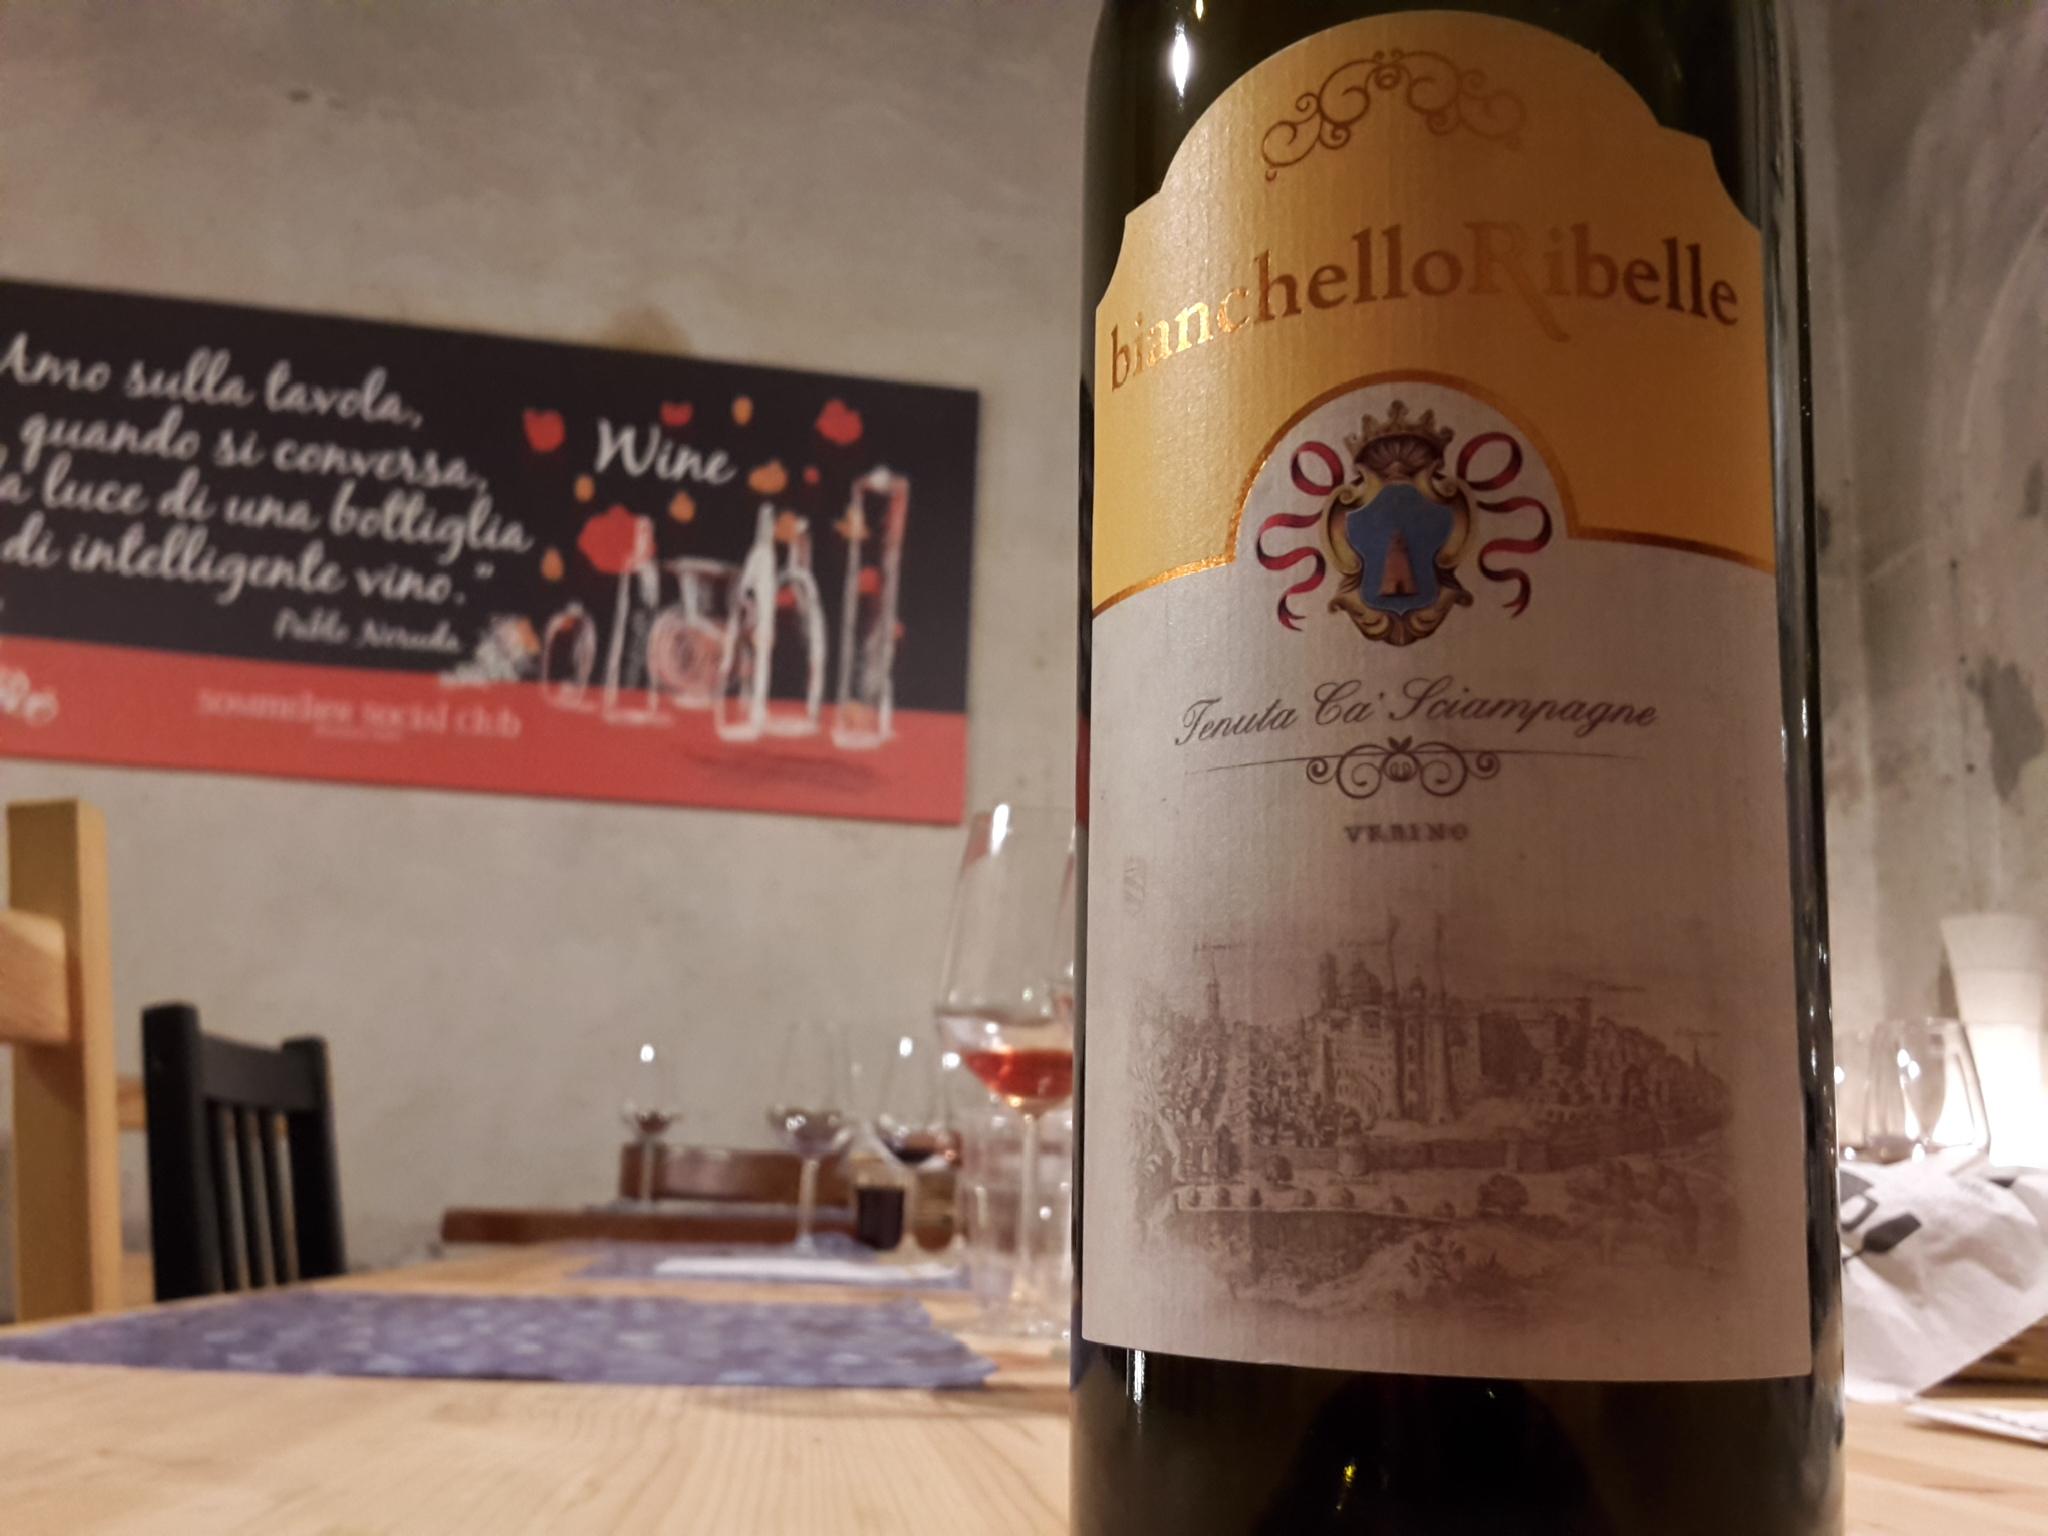 20180921_Bianchello Ribelle